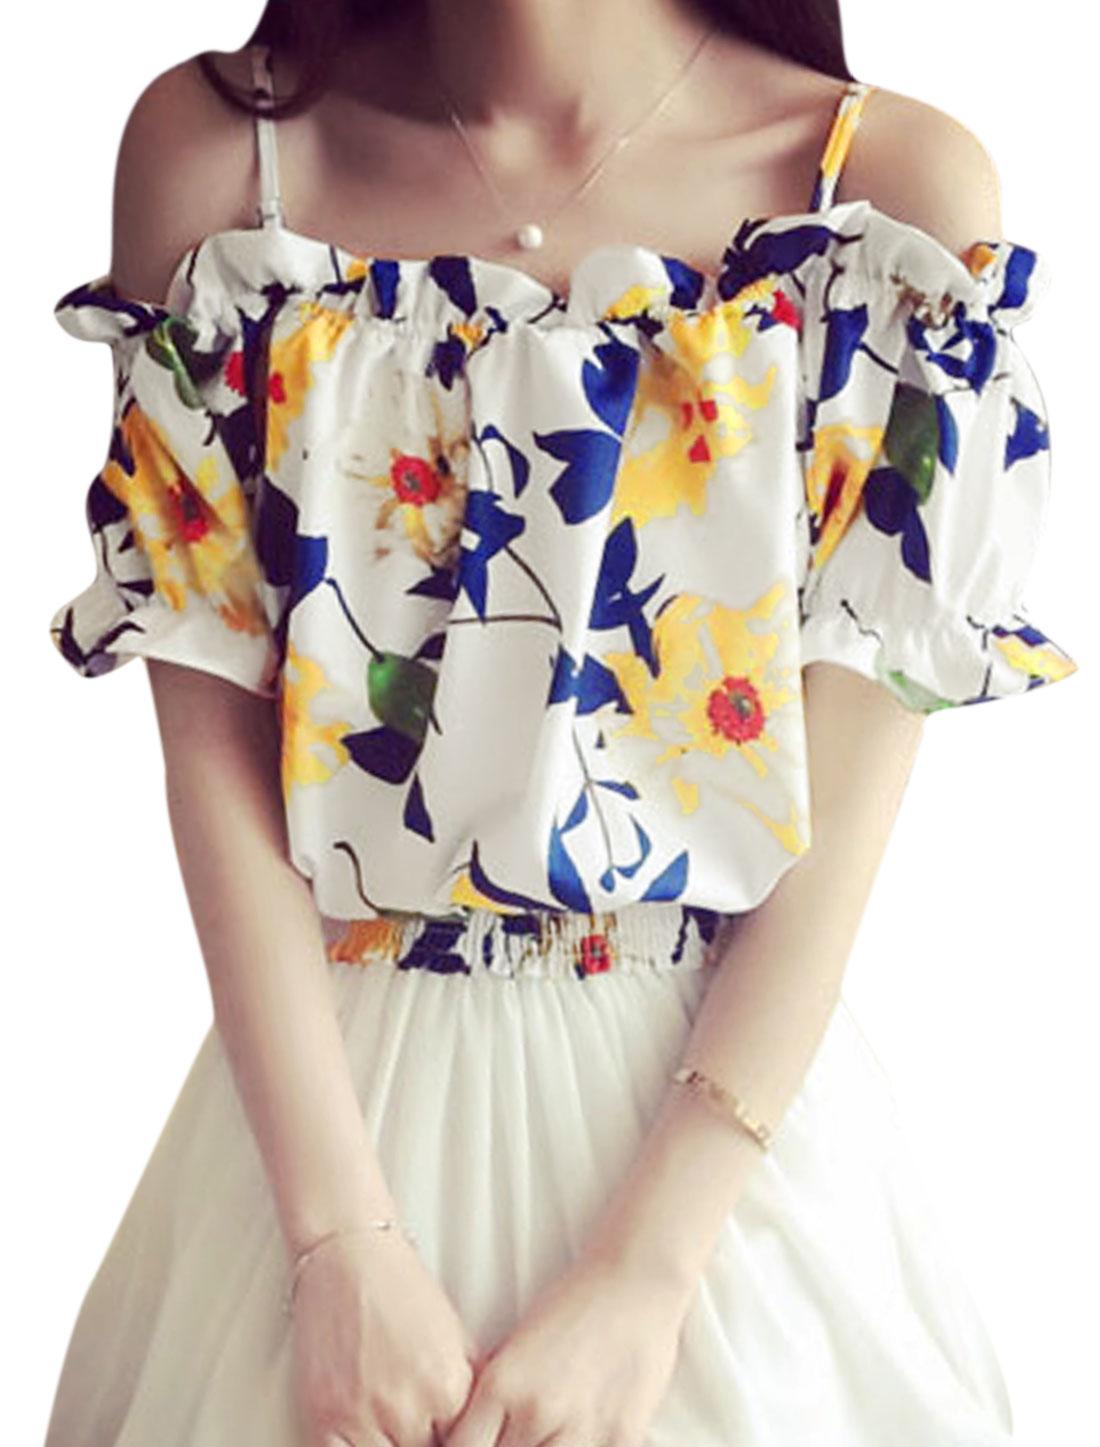 Woman Floral Prints Cut Out Shoulder Smocking Hem Top White XS